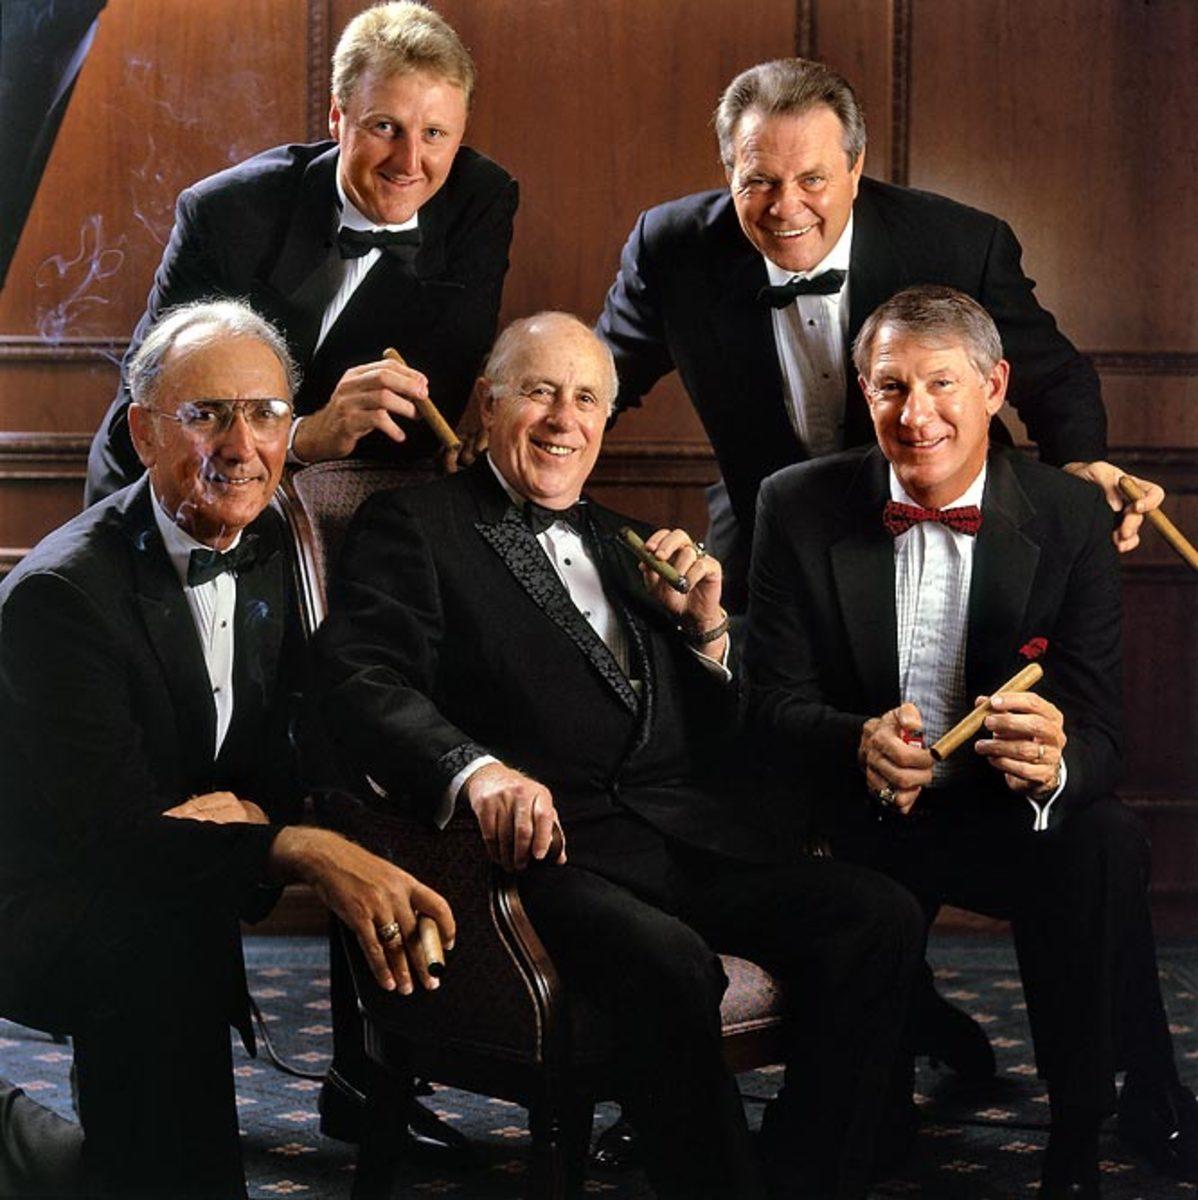 Red Auerbach, Bob Cousy, Larry Bird, Tom Heinsohn, John Havlicek